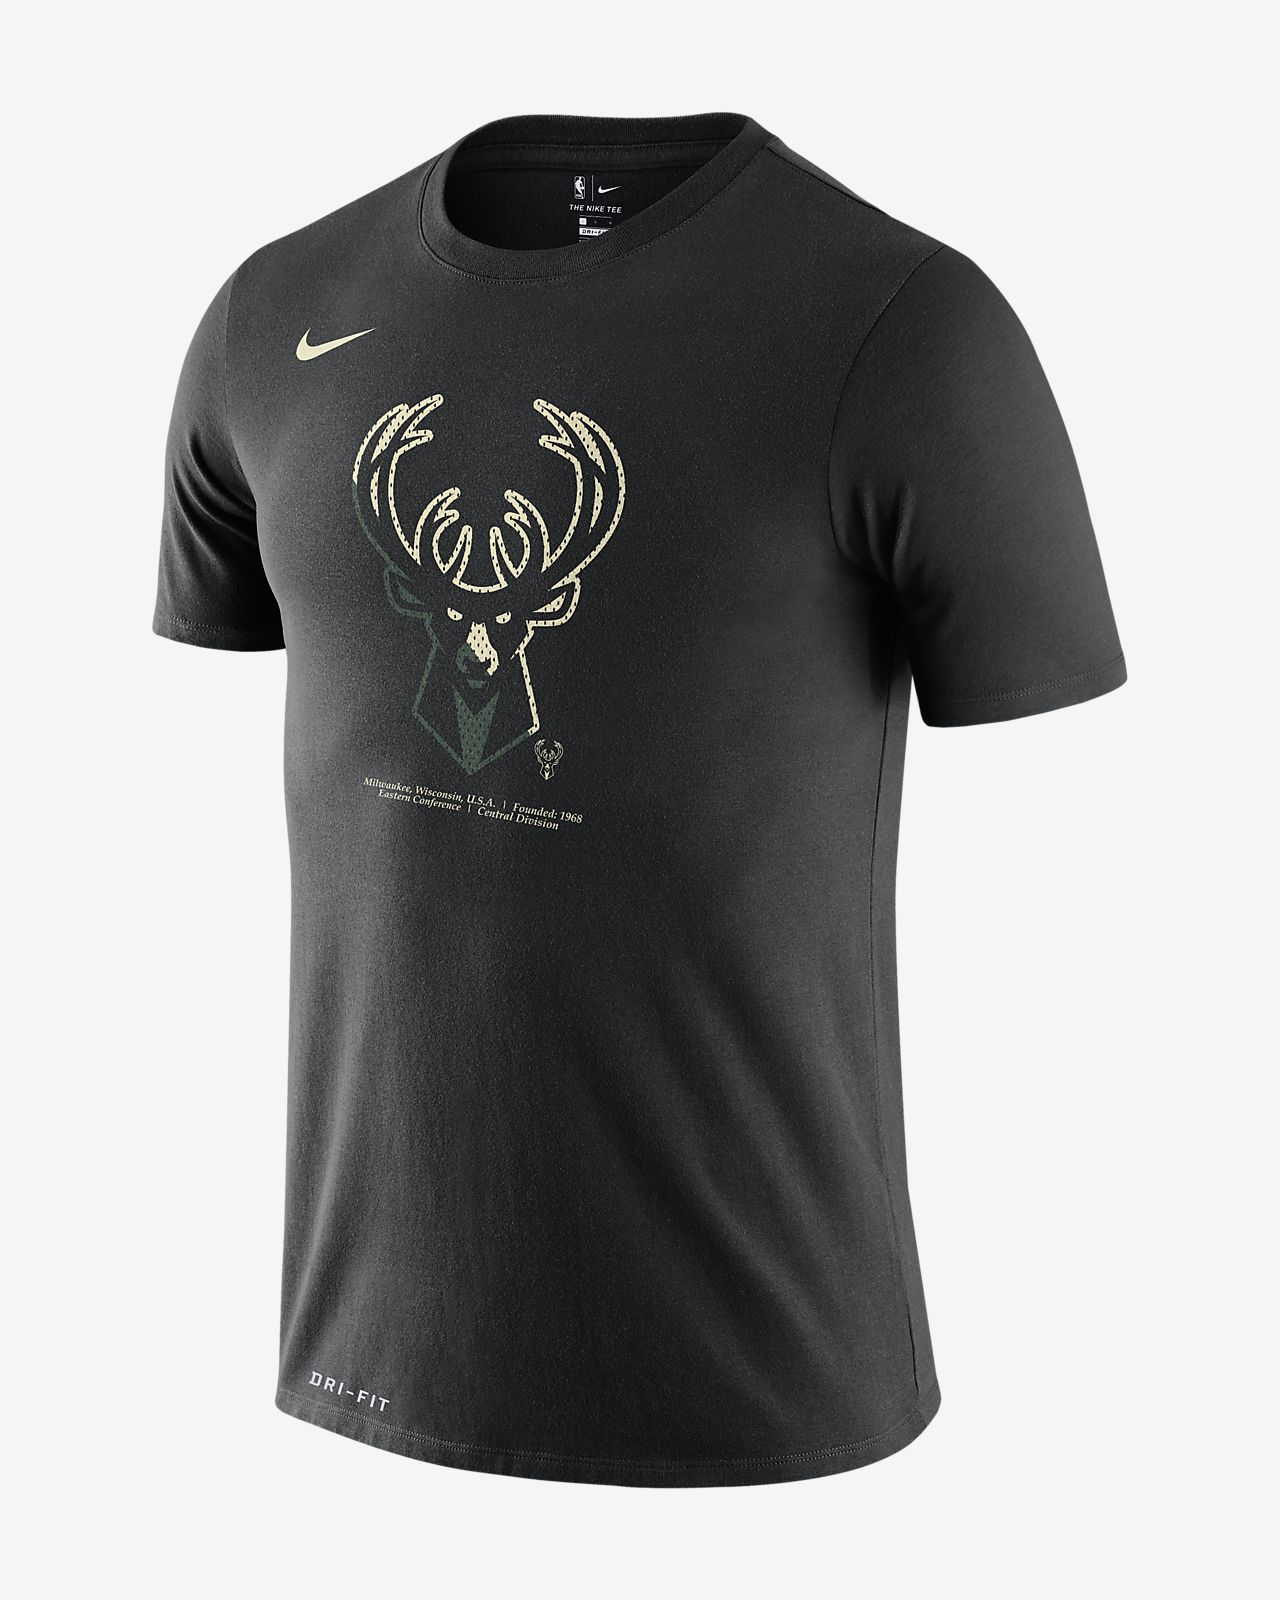 Milwaukee Bucks Nike Dri-FIT Men's NBA T-Shirt